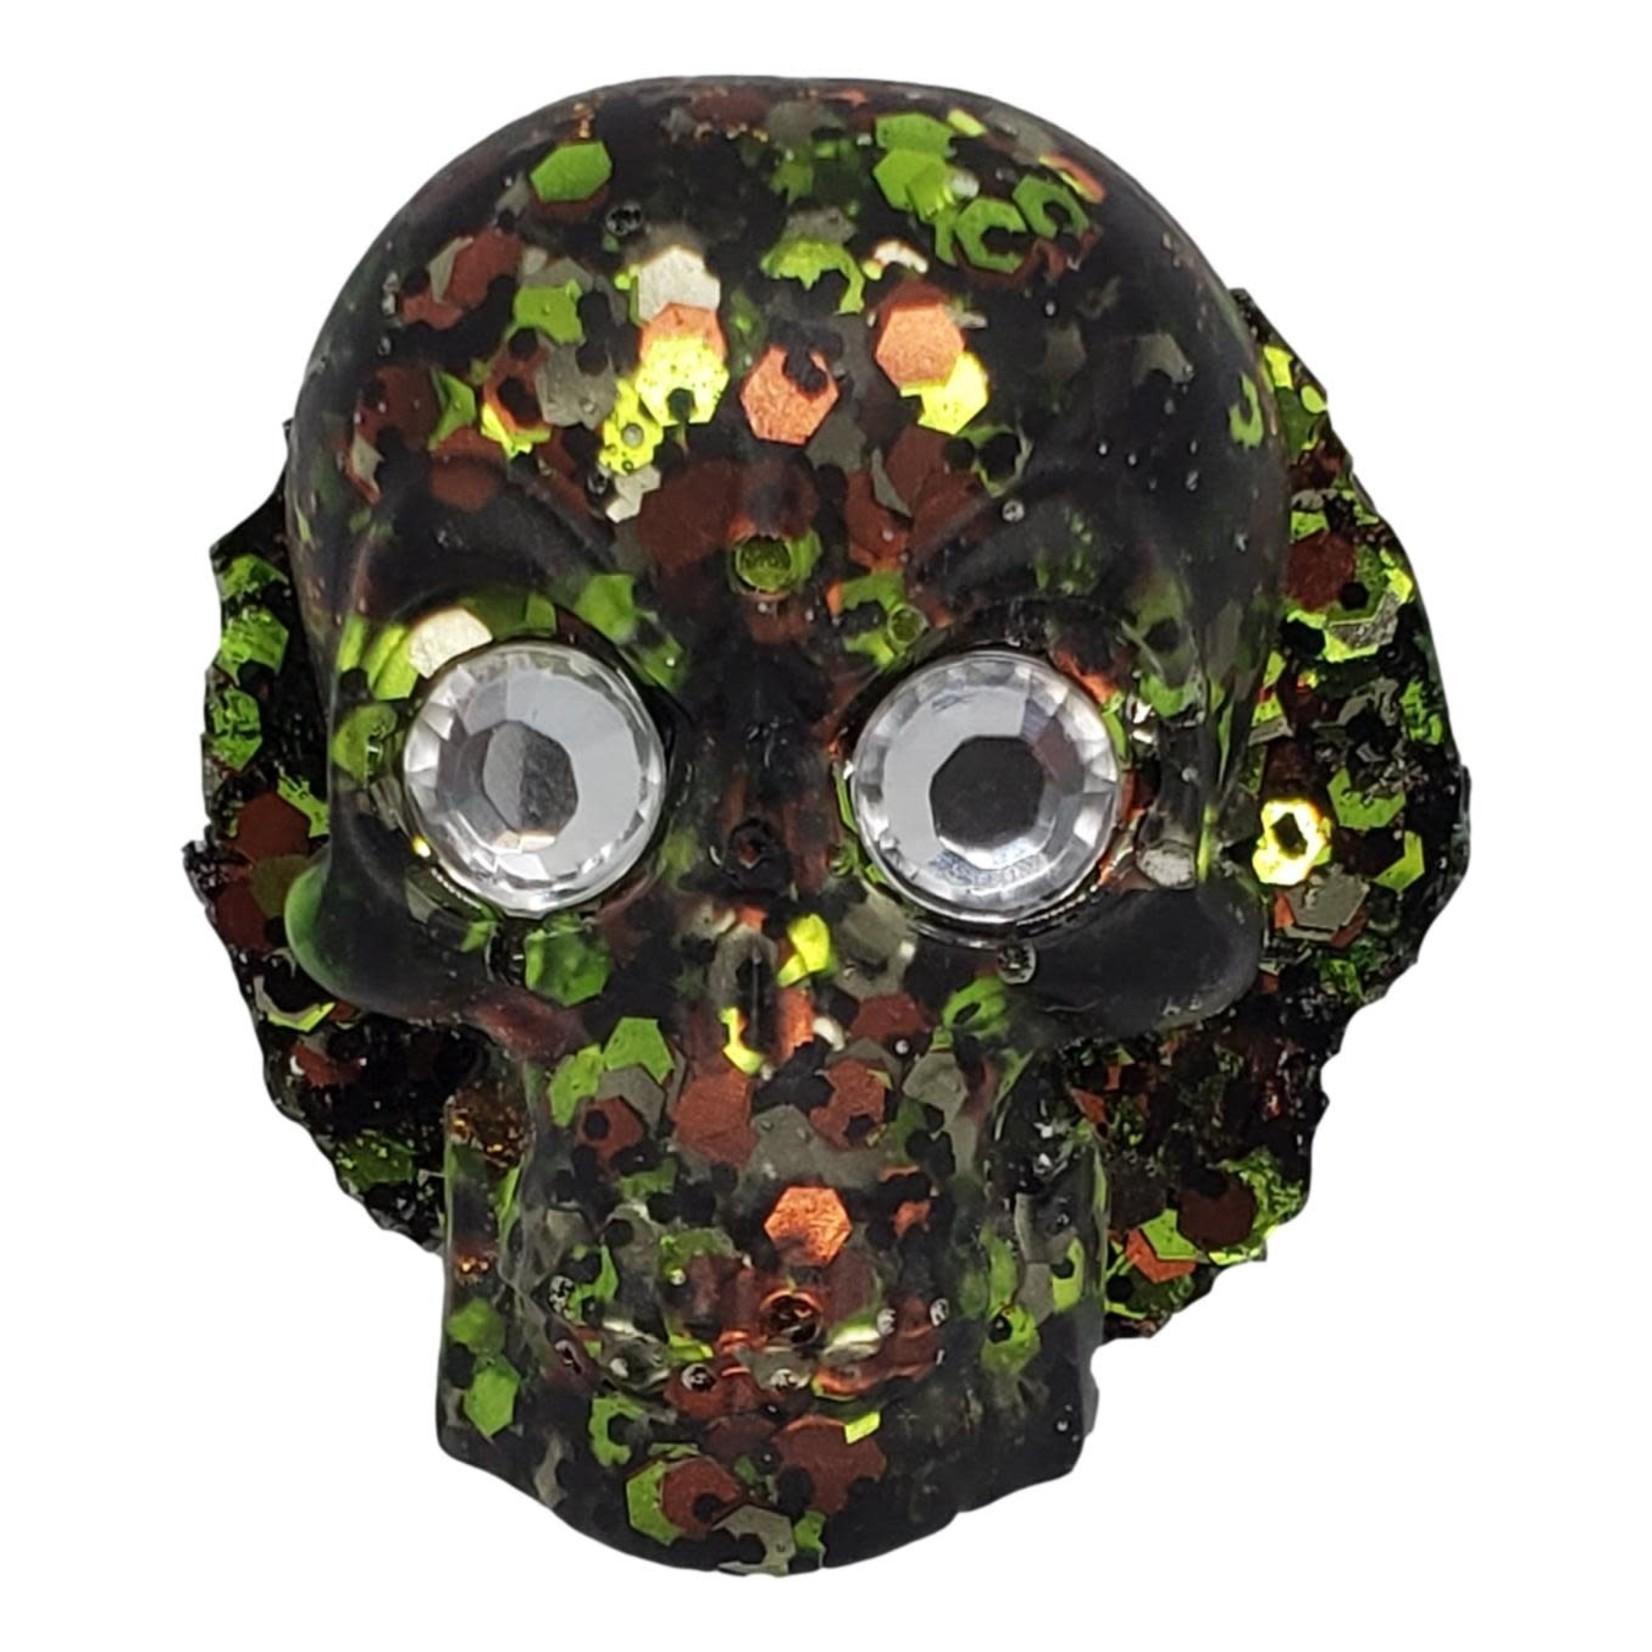 East Coast Sirens Camo Skull Phone Pop-Up